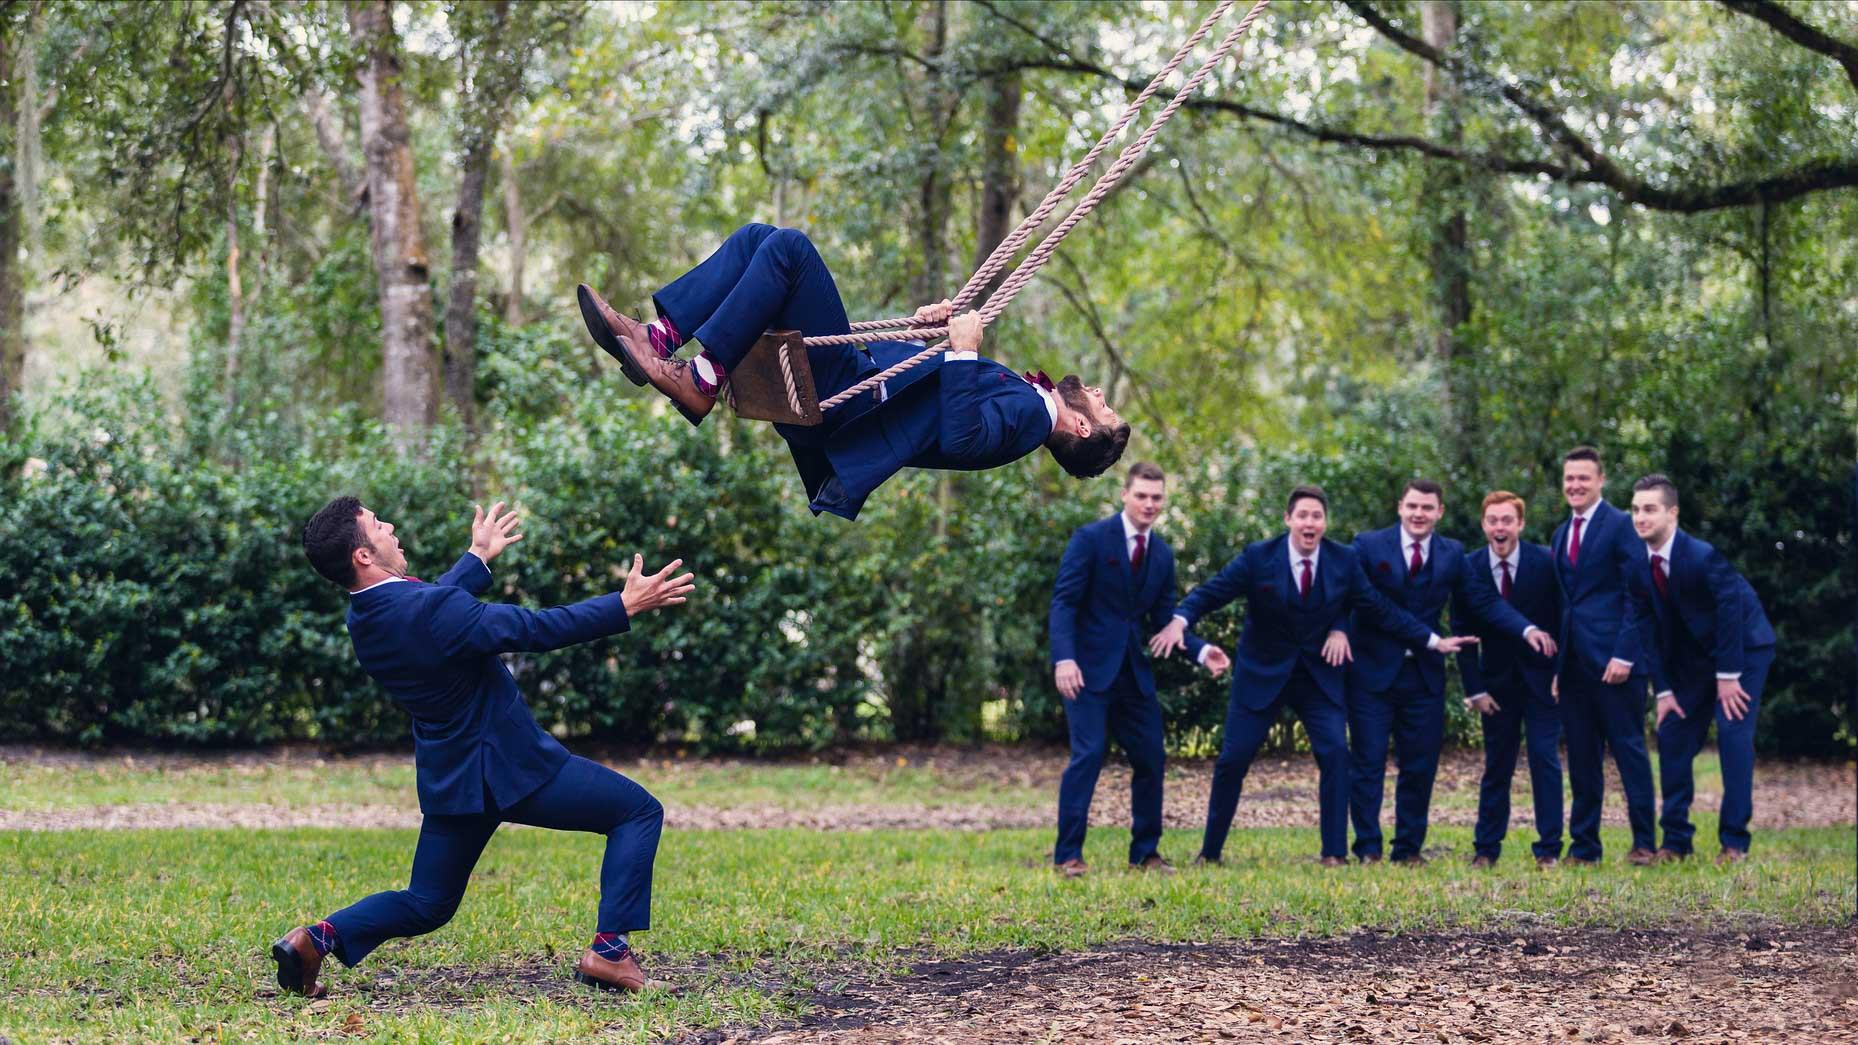 adam-szarmack-bowing-oaks-wedding-photographer-jacksonville-5.jpg